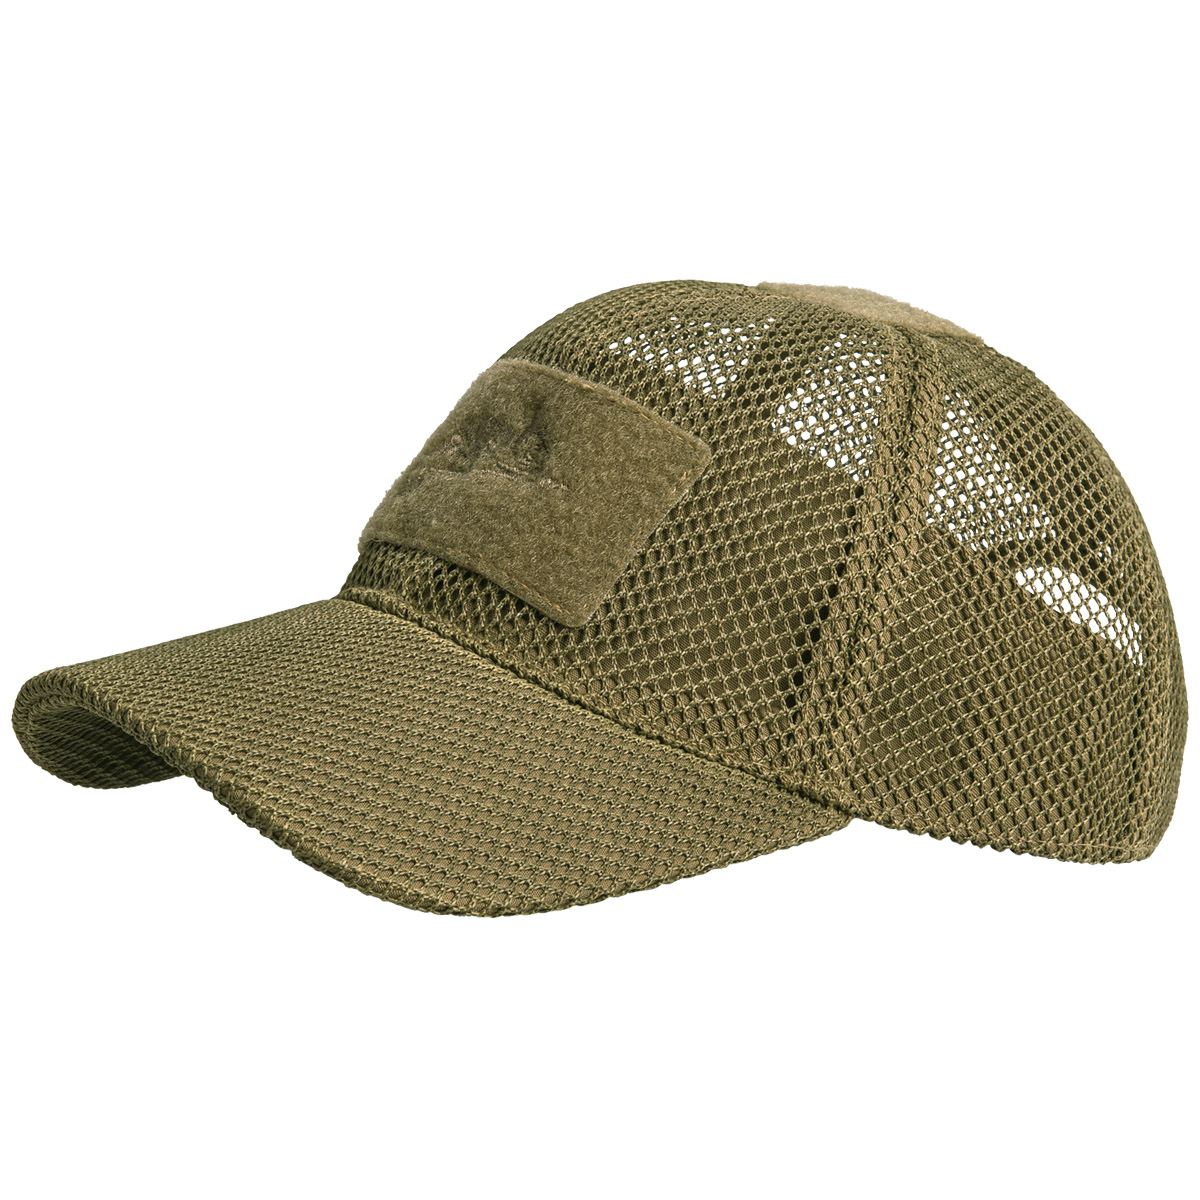 Helikon Military Tactical Mesh Baseball Cap Operator Cadet